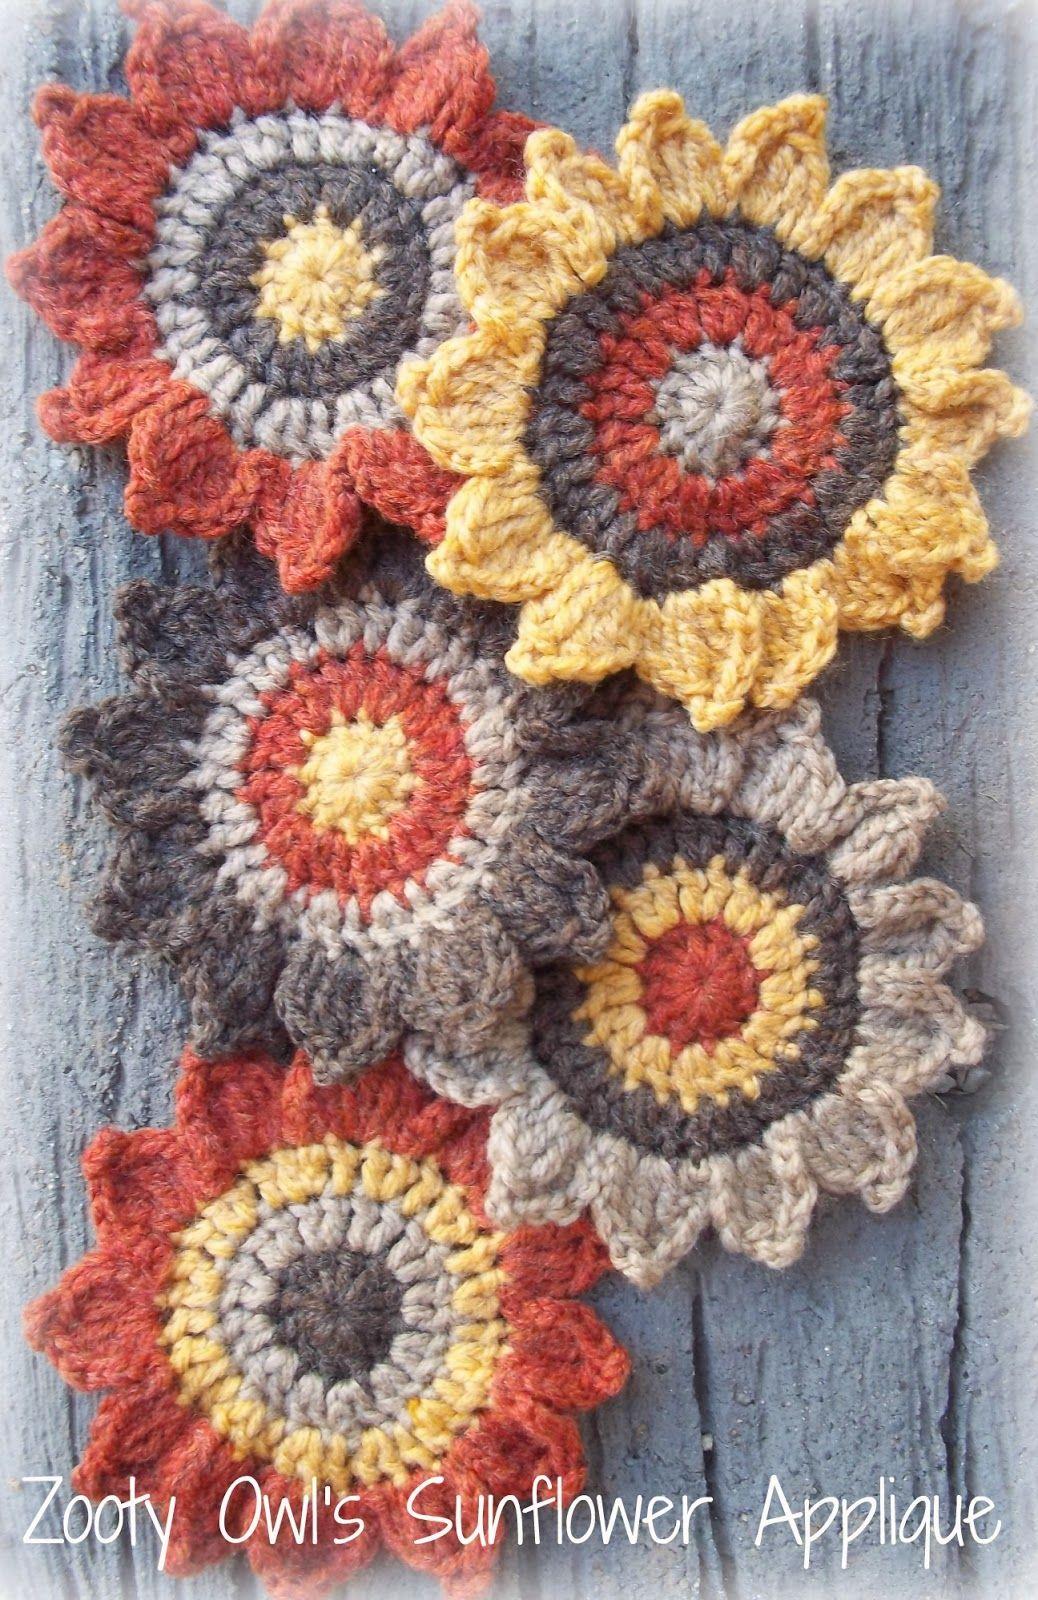 Crochet Sunflower Applique Pattern - free pattern link to Ravelry ...